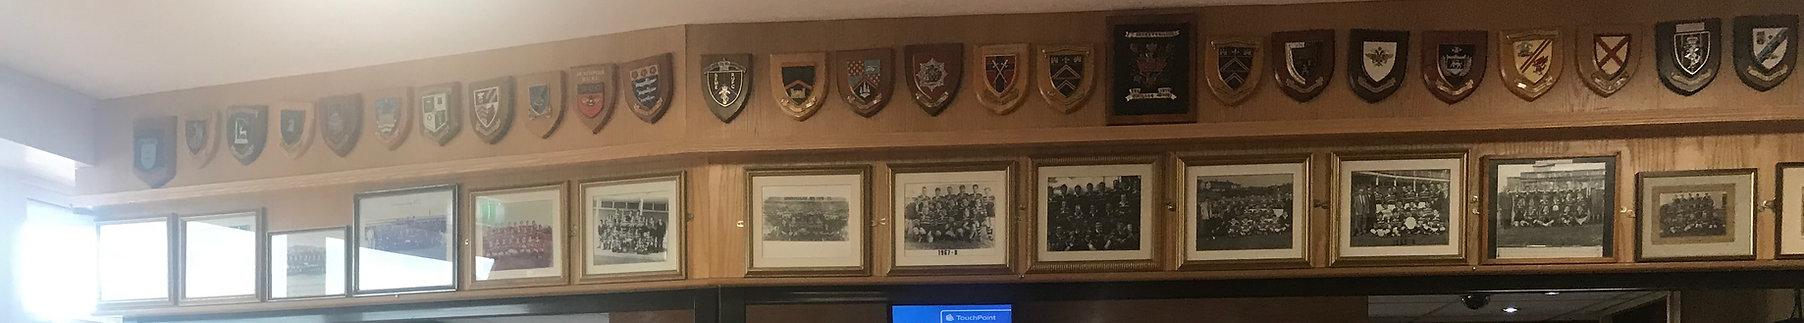 Croesceiliog Cricket and Rugby Club